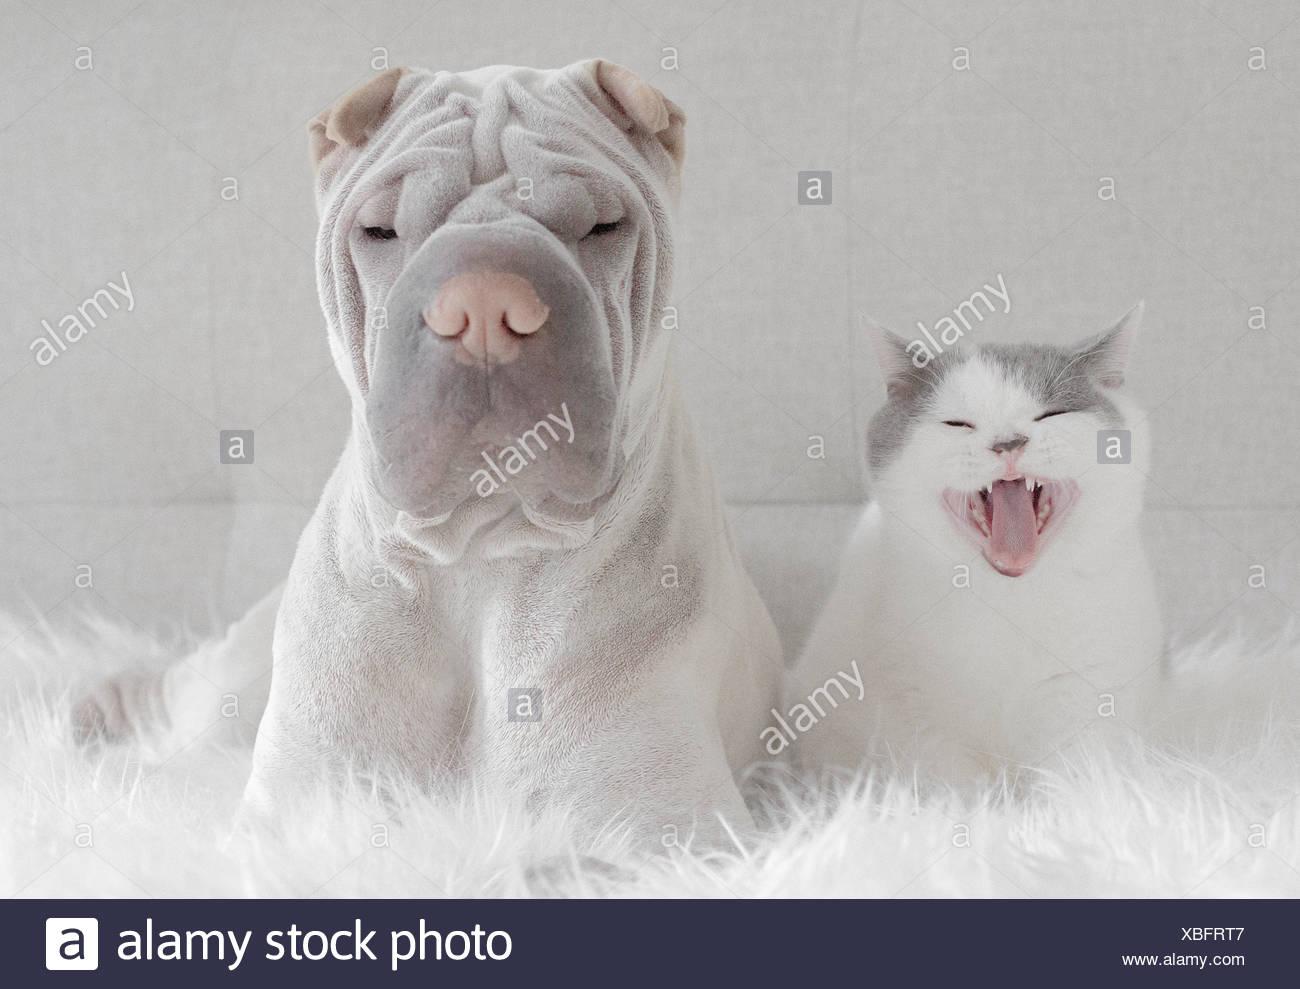 Vista frontal de Shar Pei y cat. Imagen De Stock